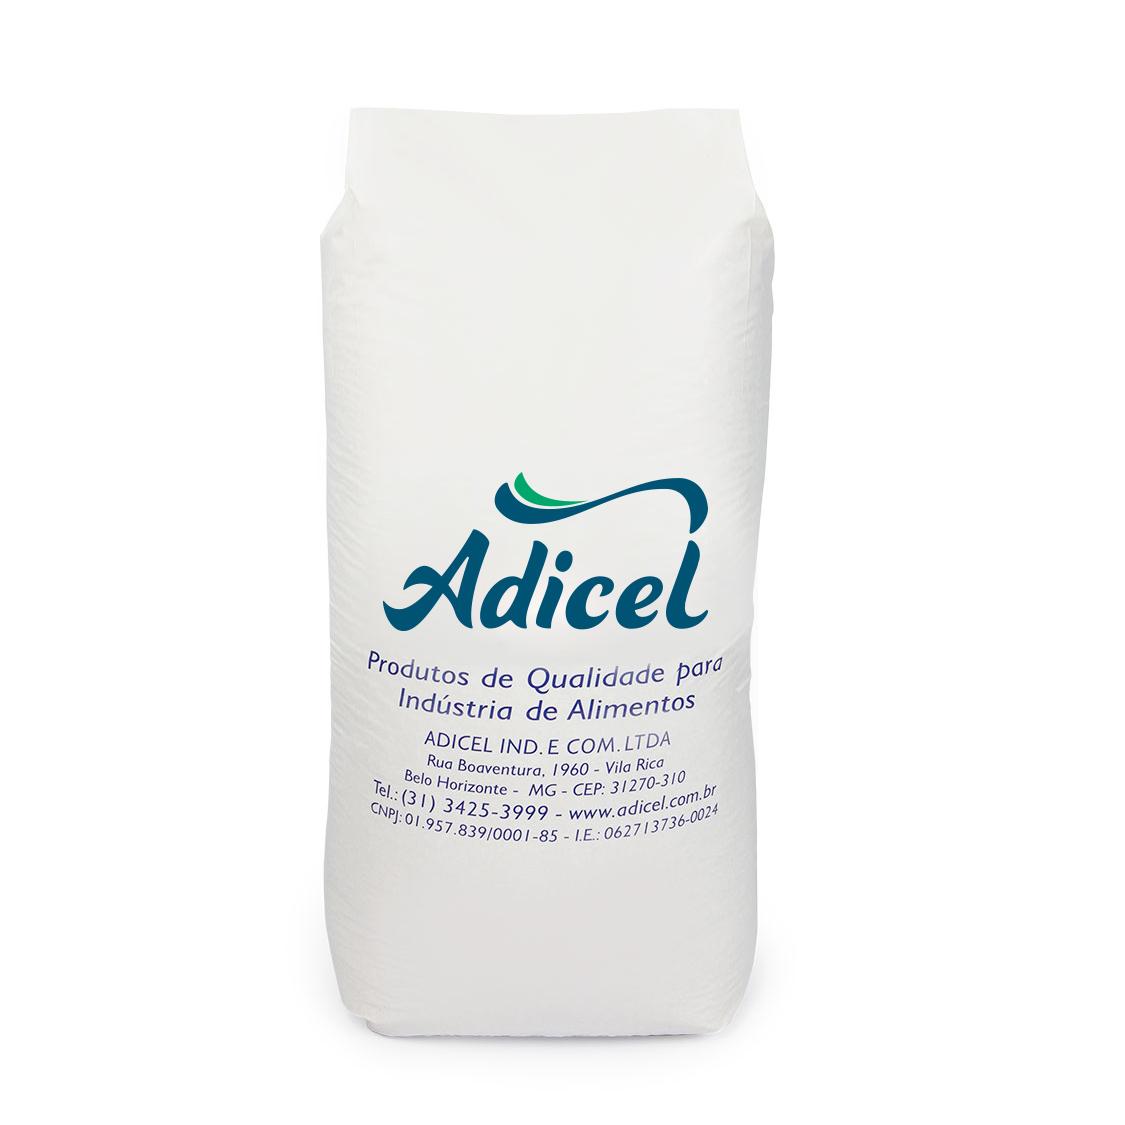 Proteína Texturizada De Soja Cor Caramelo Tamanho Grande (Torresmo) - 10 kg